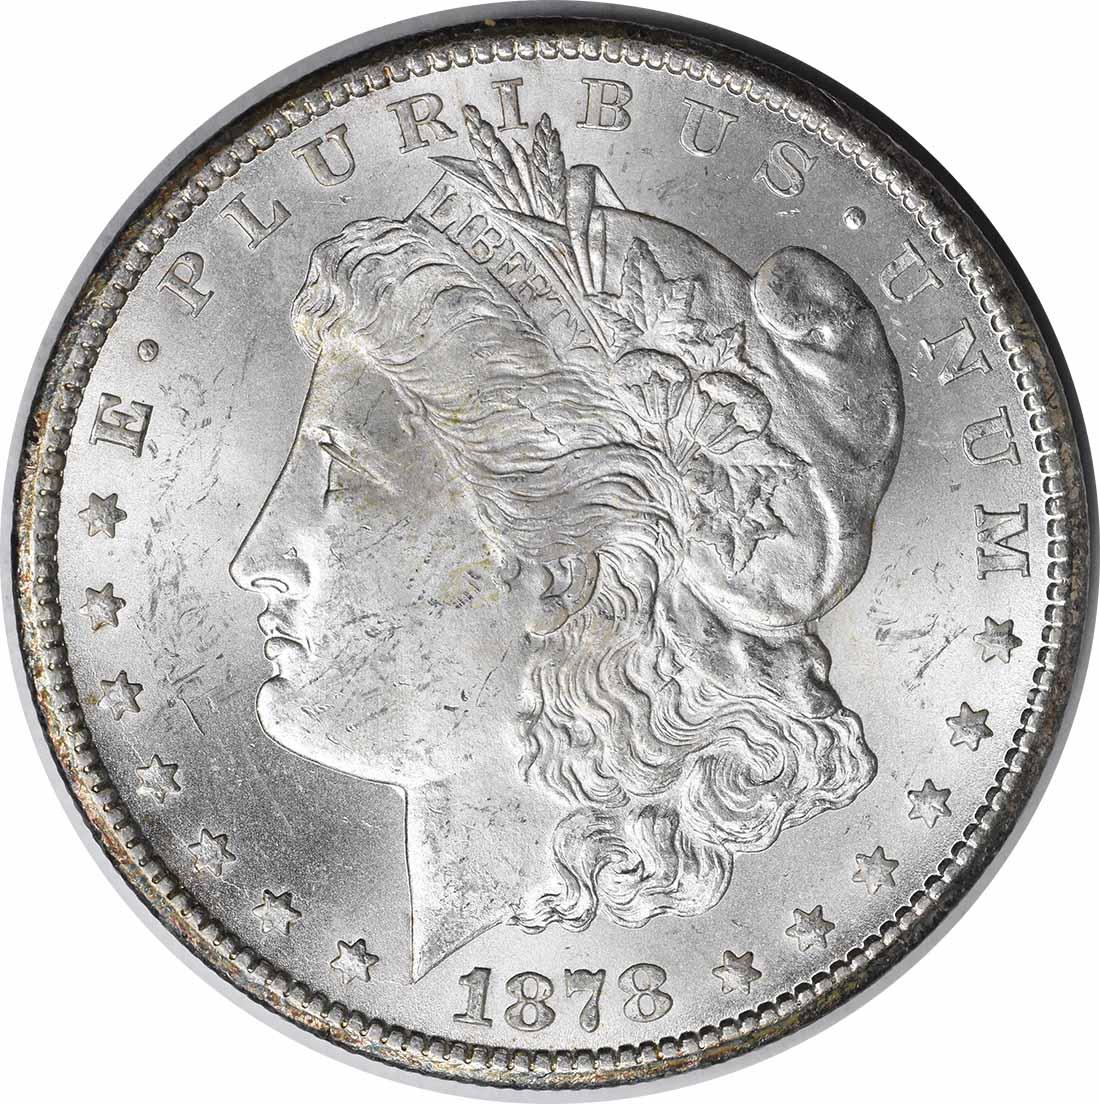 1878-CC Morgan Silver Dollar MS60 Uncertified #234